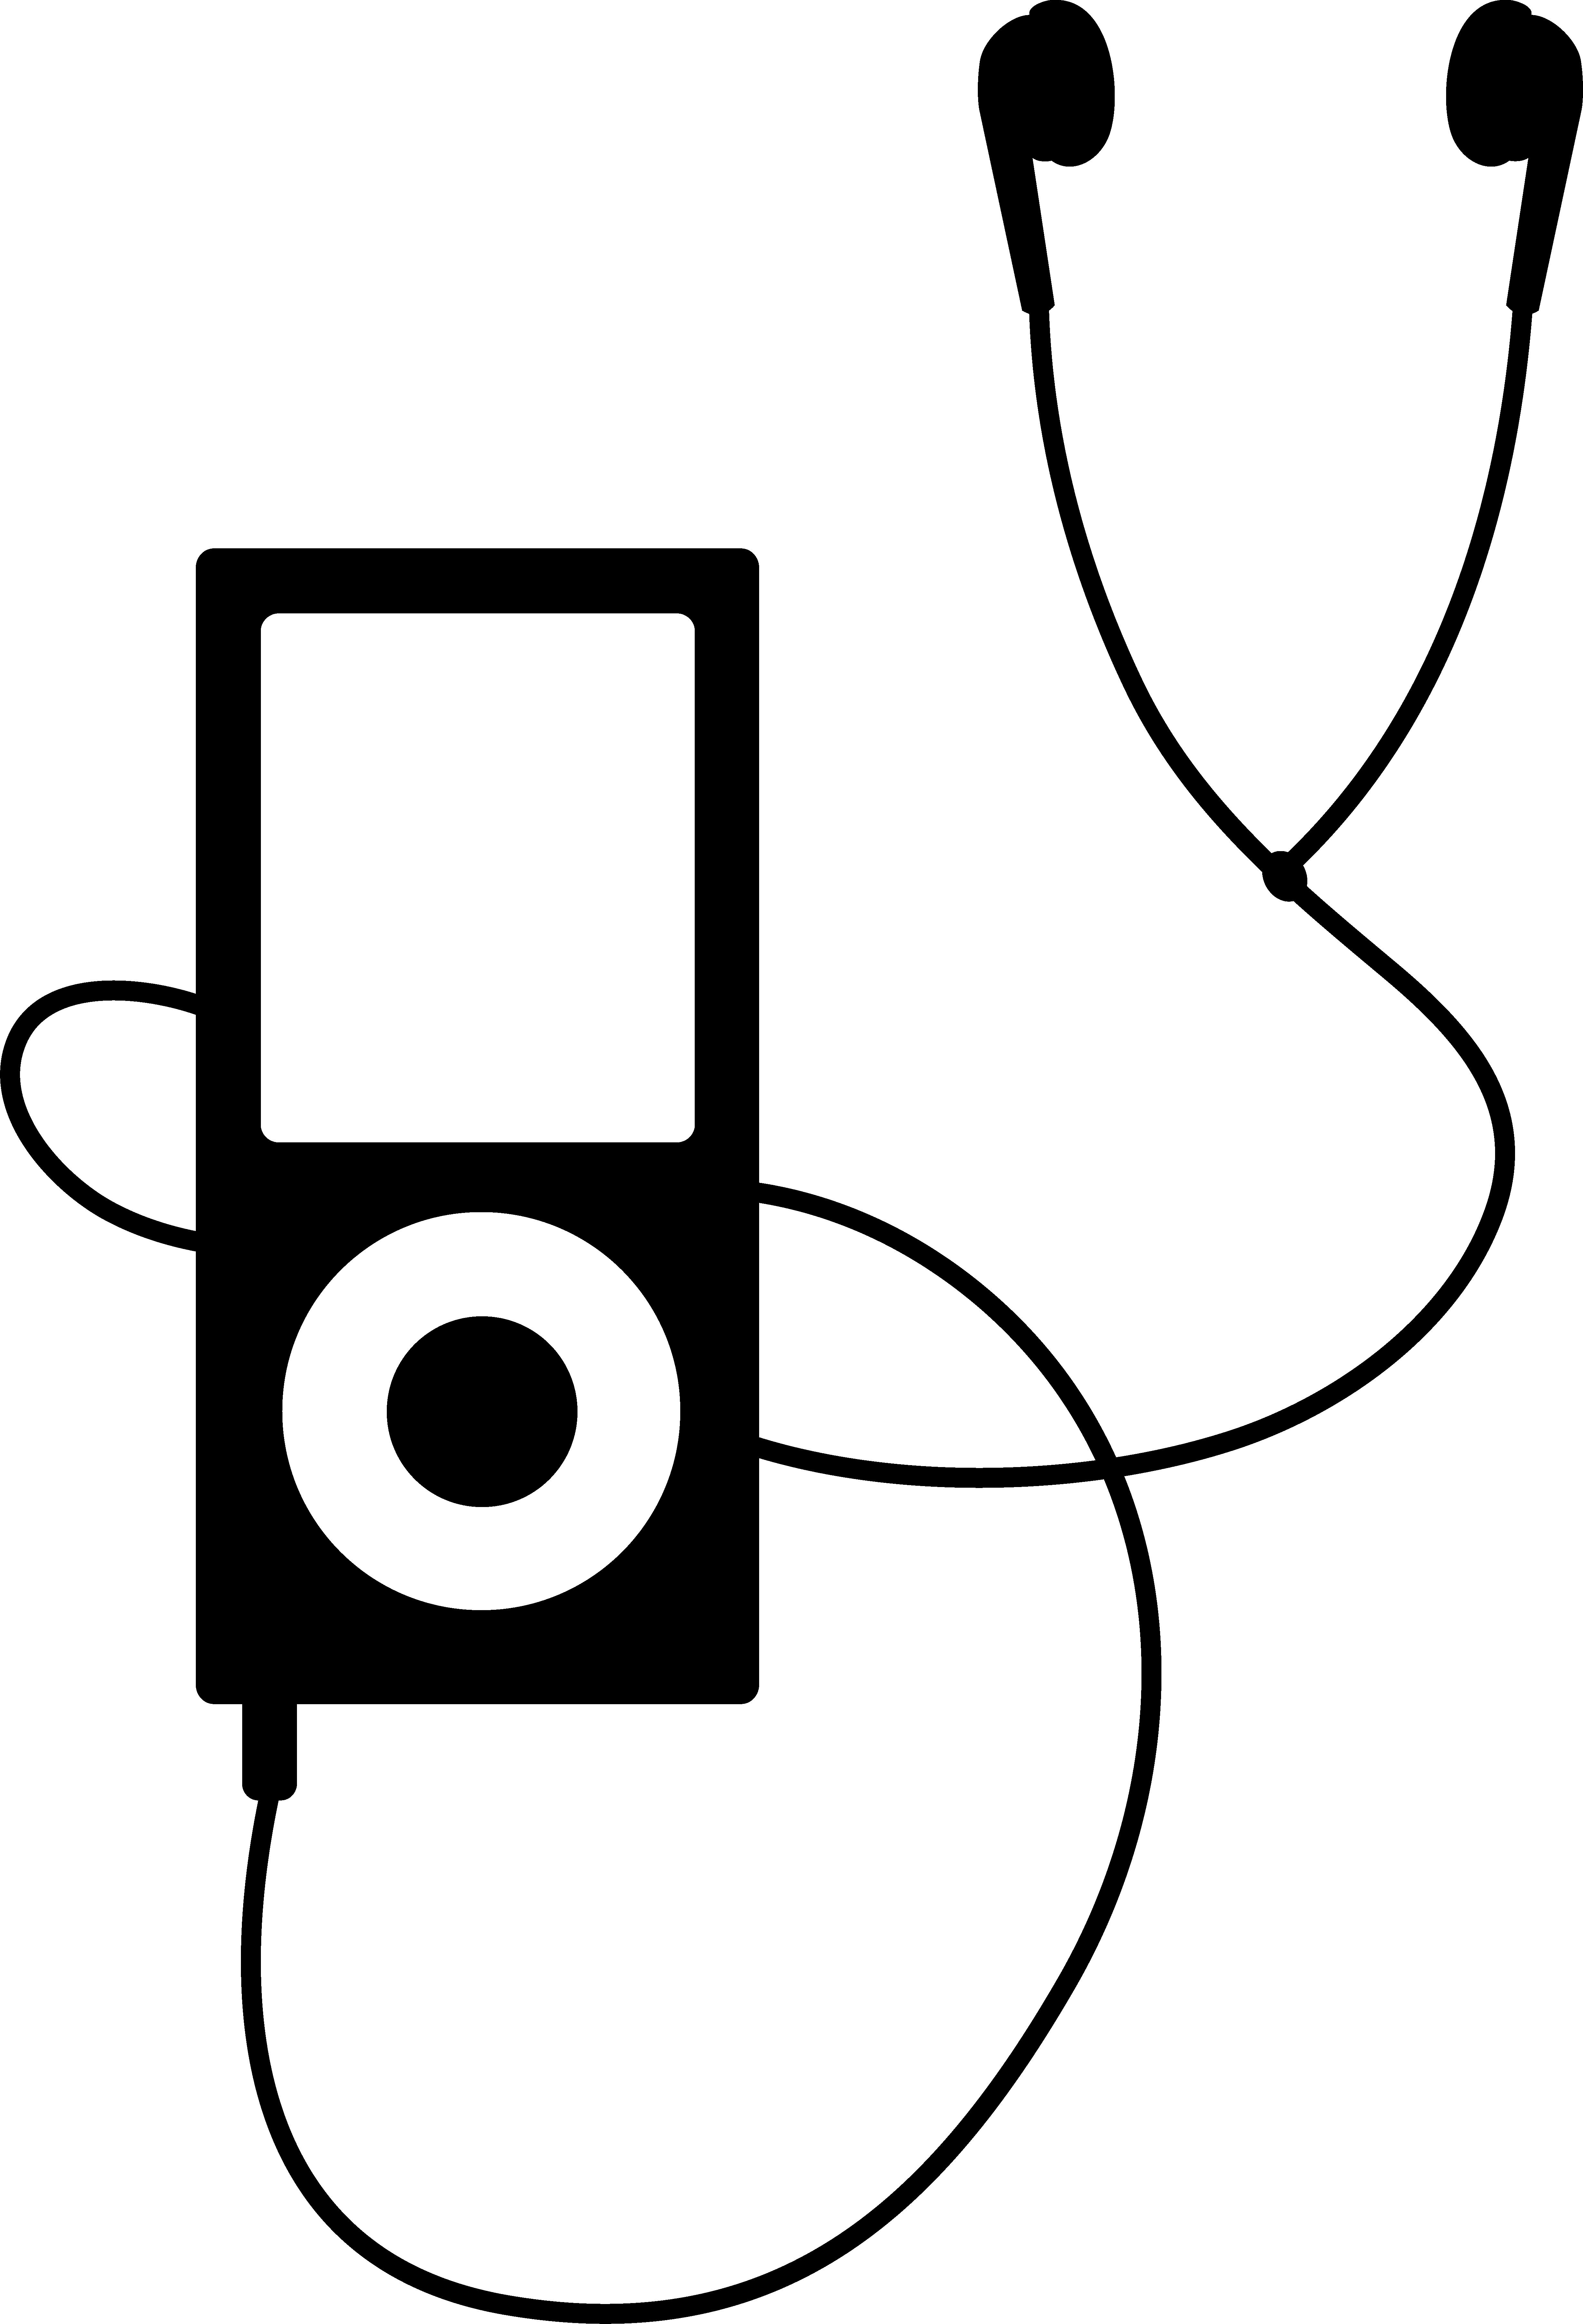 ipod clipart-ipod clipart-4